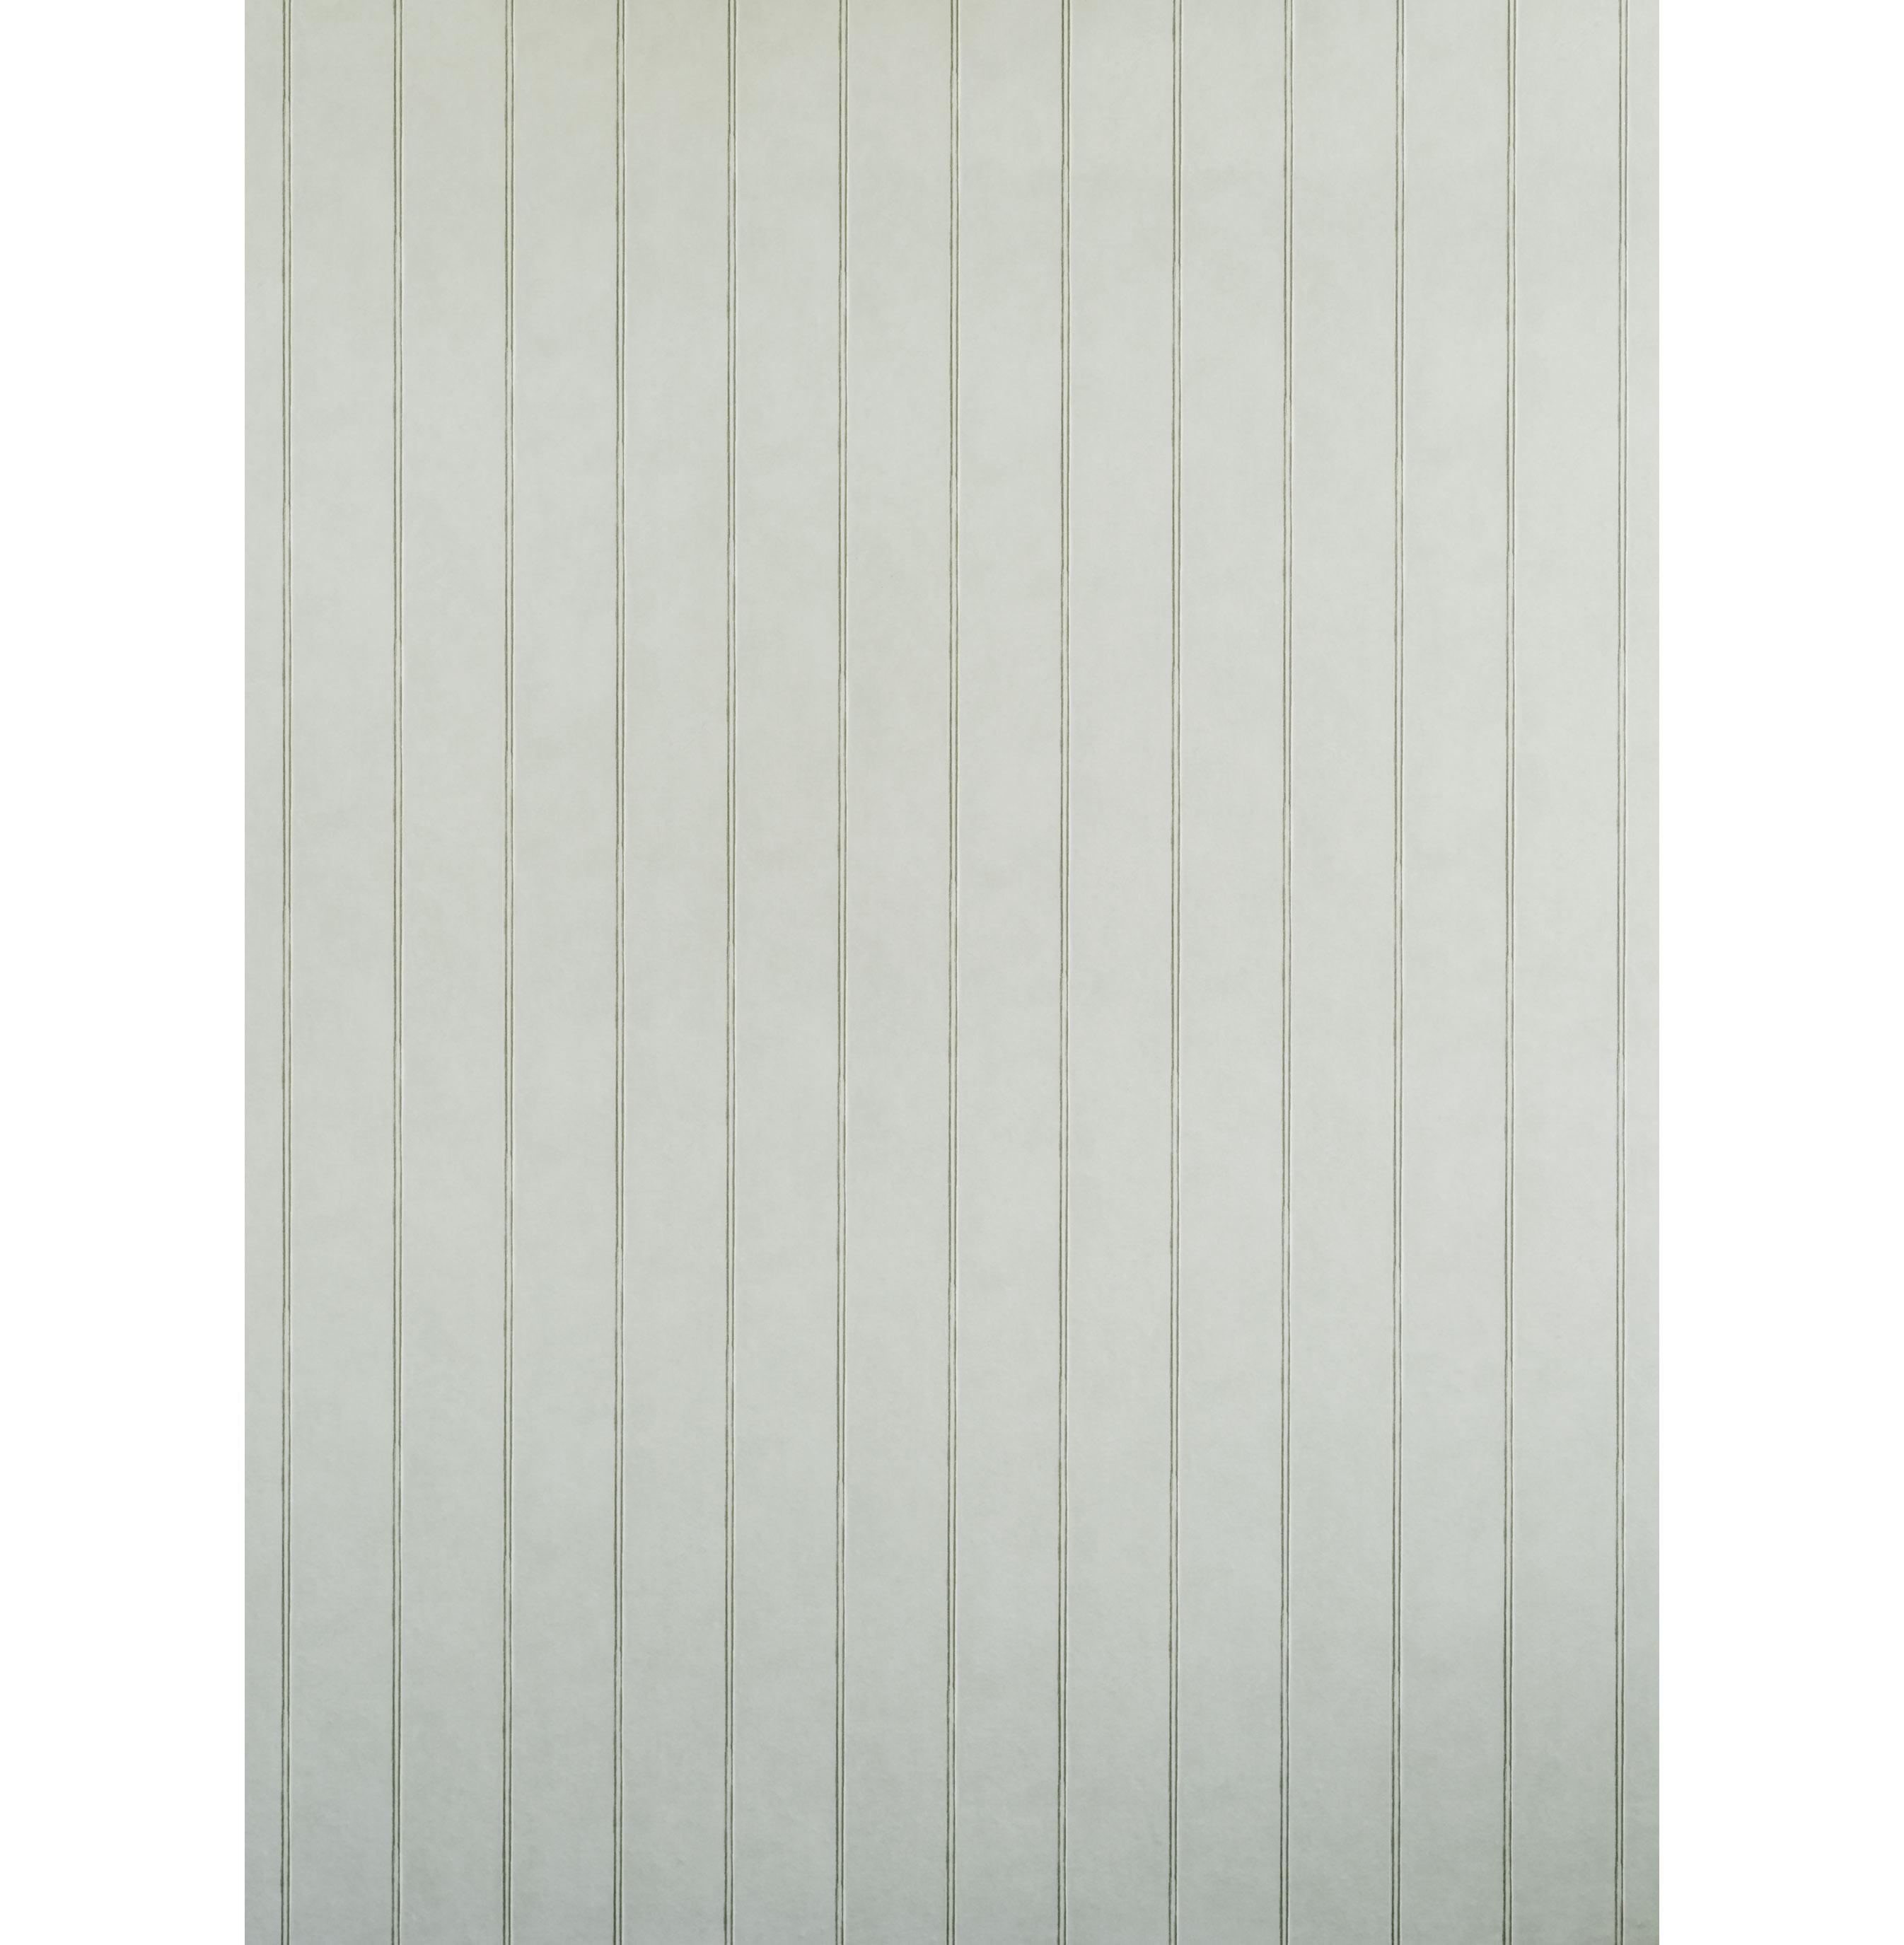 Tongue Groove Wood Panel Rustic Wallpaper - Cloud - 2 Rolls